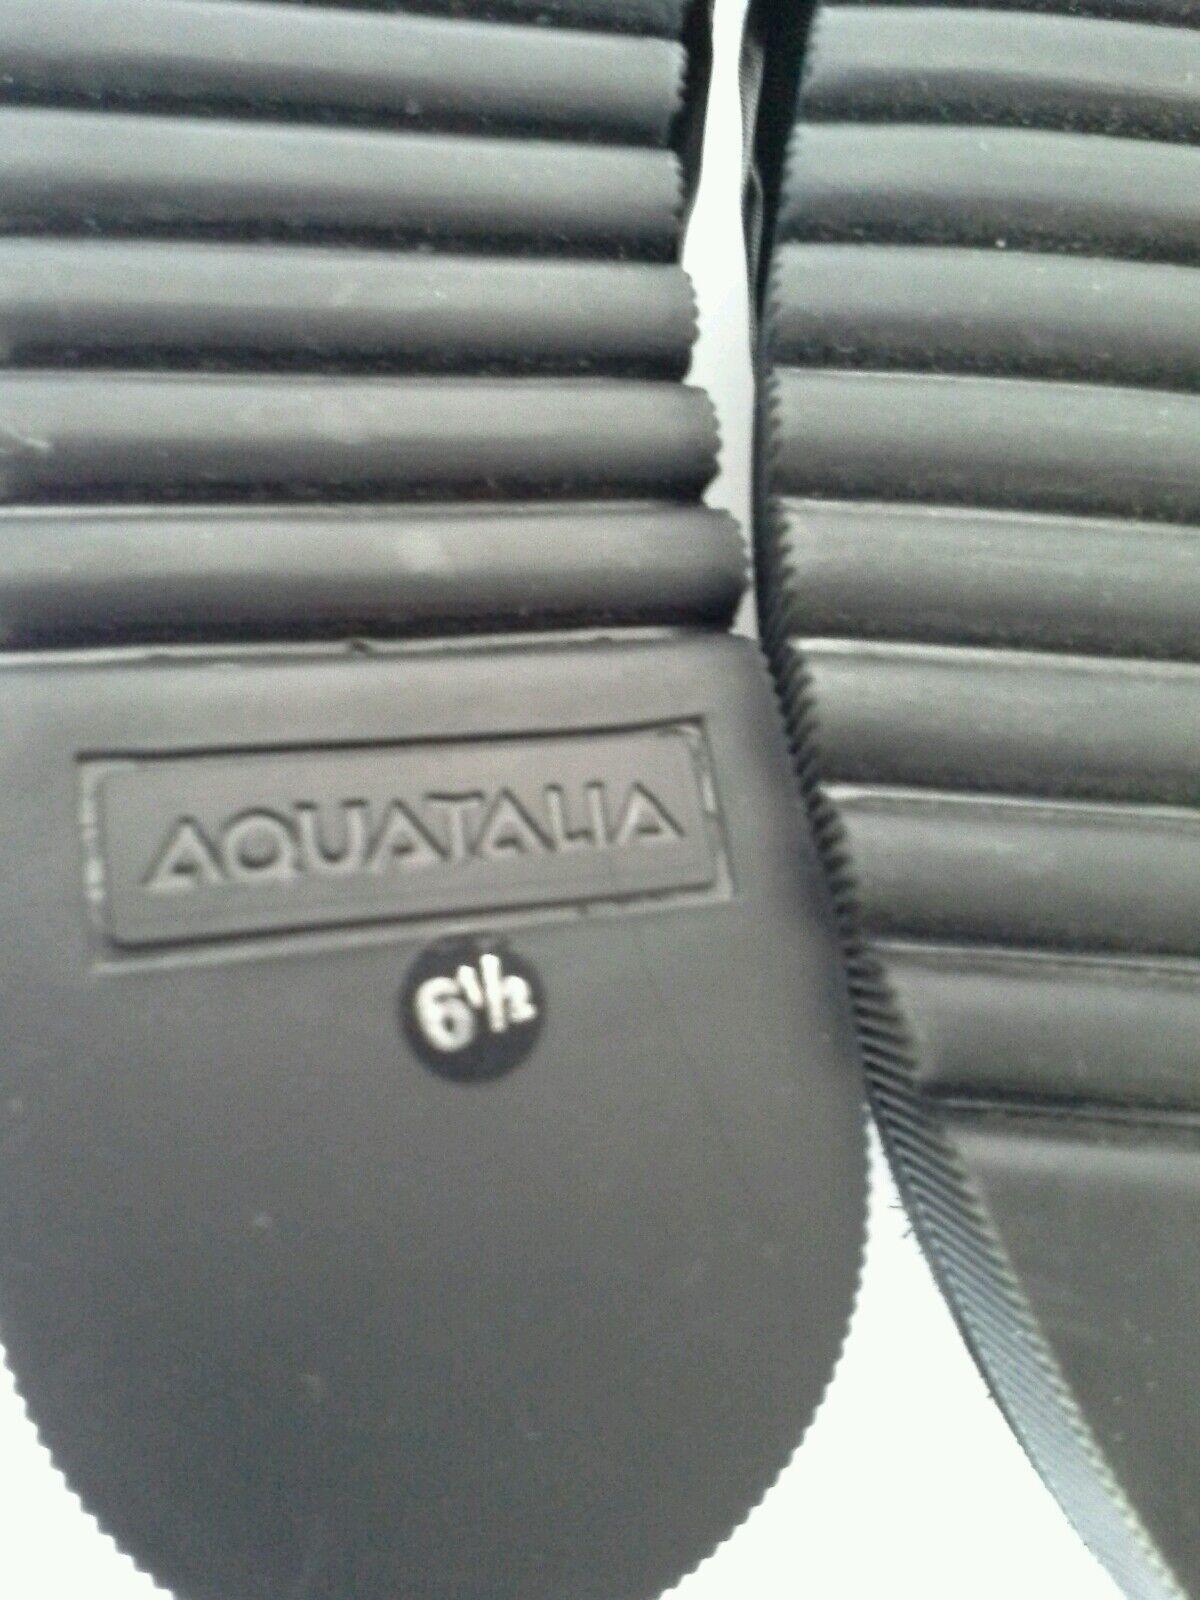 Aquatalia Aida Plataforma Zapatillas De Gamuza Gamuza De Cuero Negro Astilla en relieve Talle 6.5 ed6f97